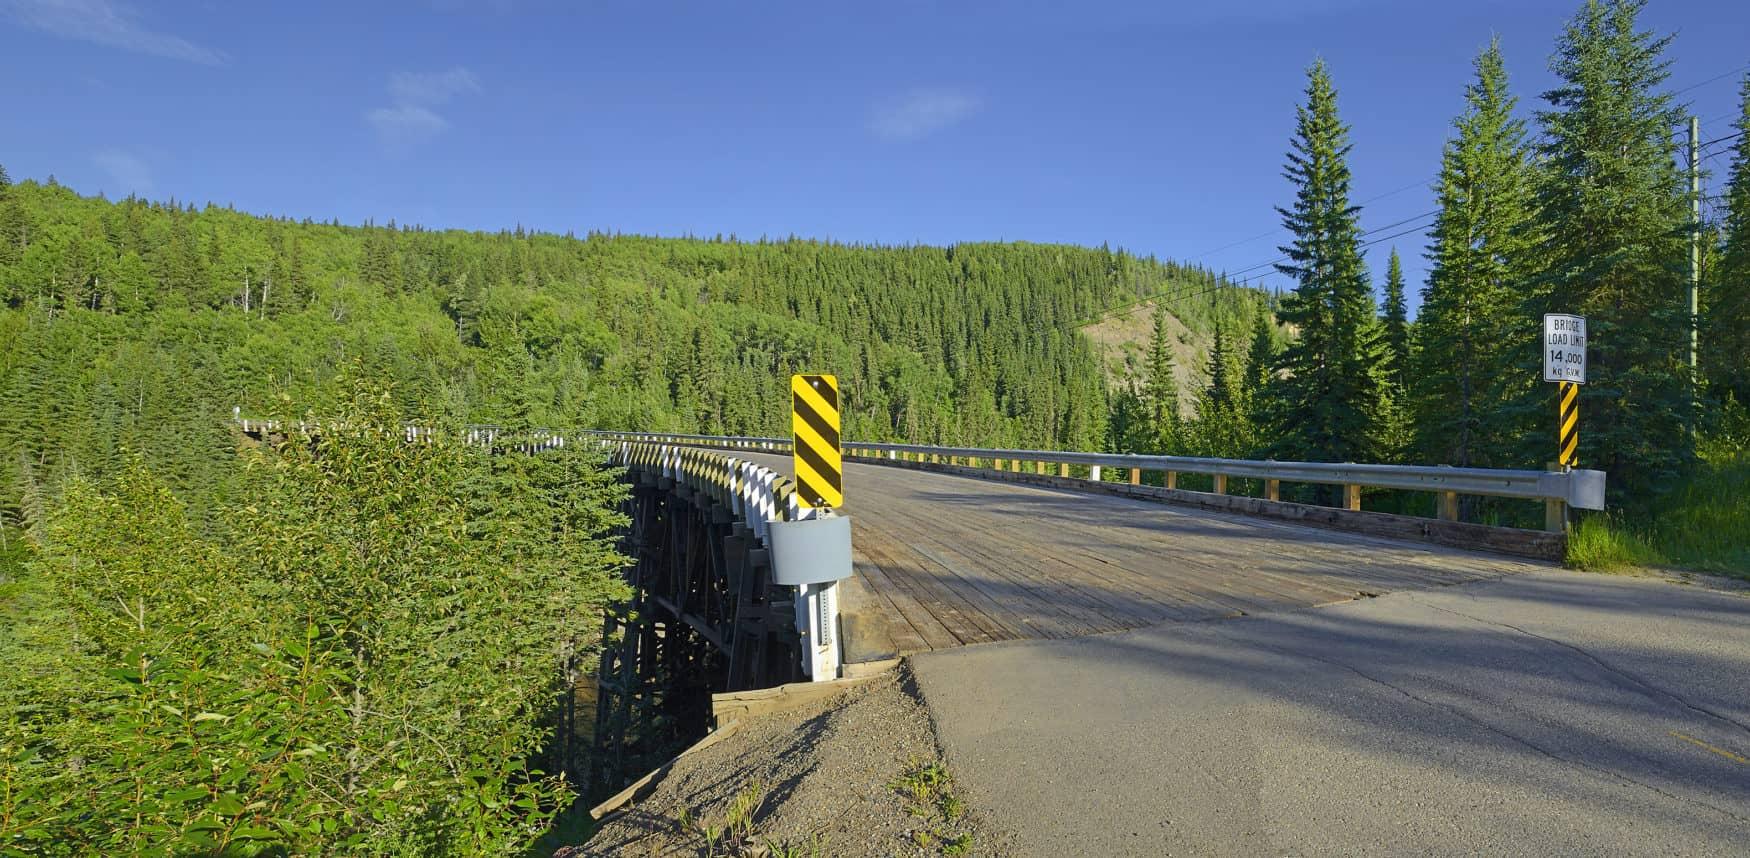 Historische Kiskatinaw-Kurvenbrücke auf dem Alaska Highway in British Columbia, Kanada